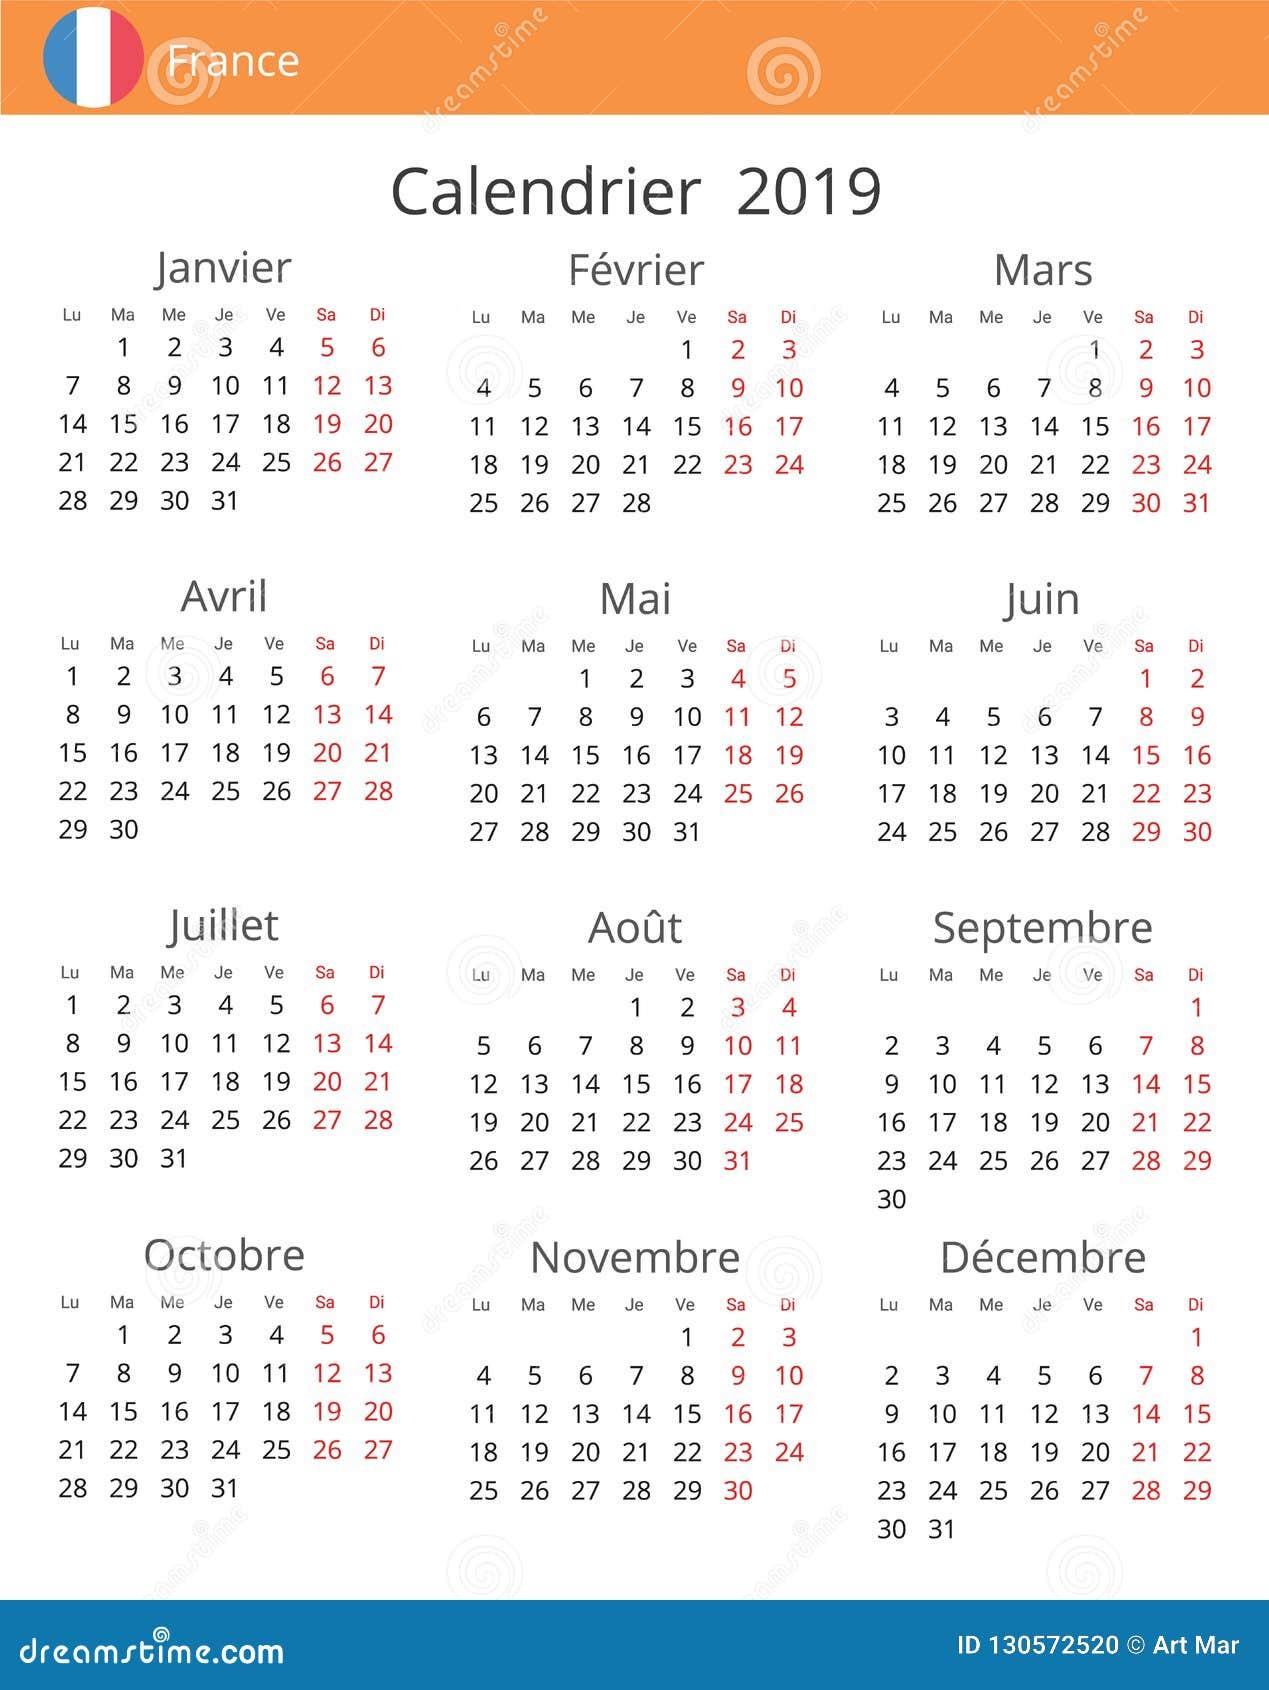 Calendario 2019 Con Numero Week.Calendar 2019 Year For France Country Stock Illustration